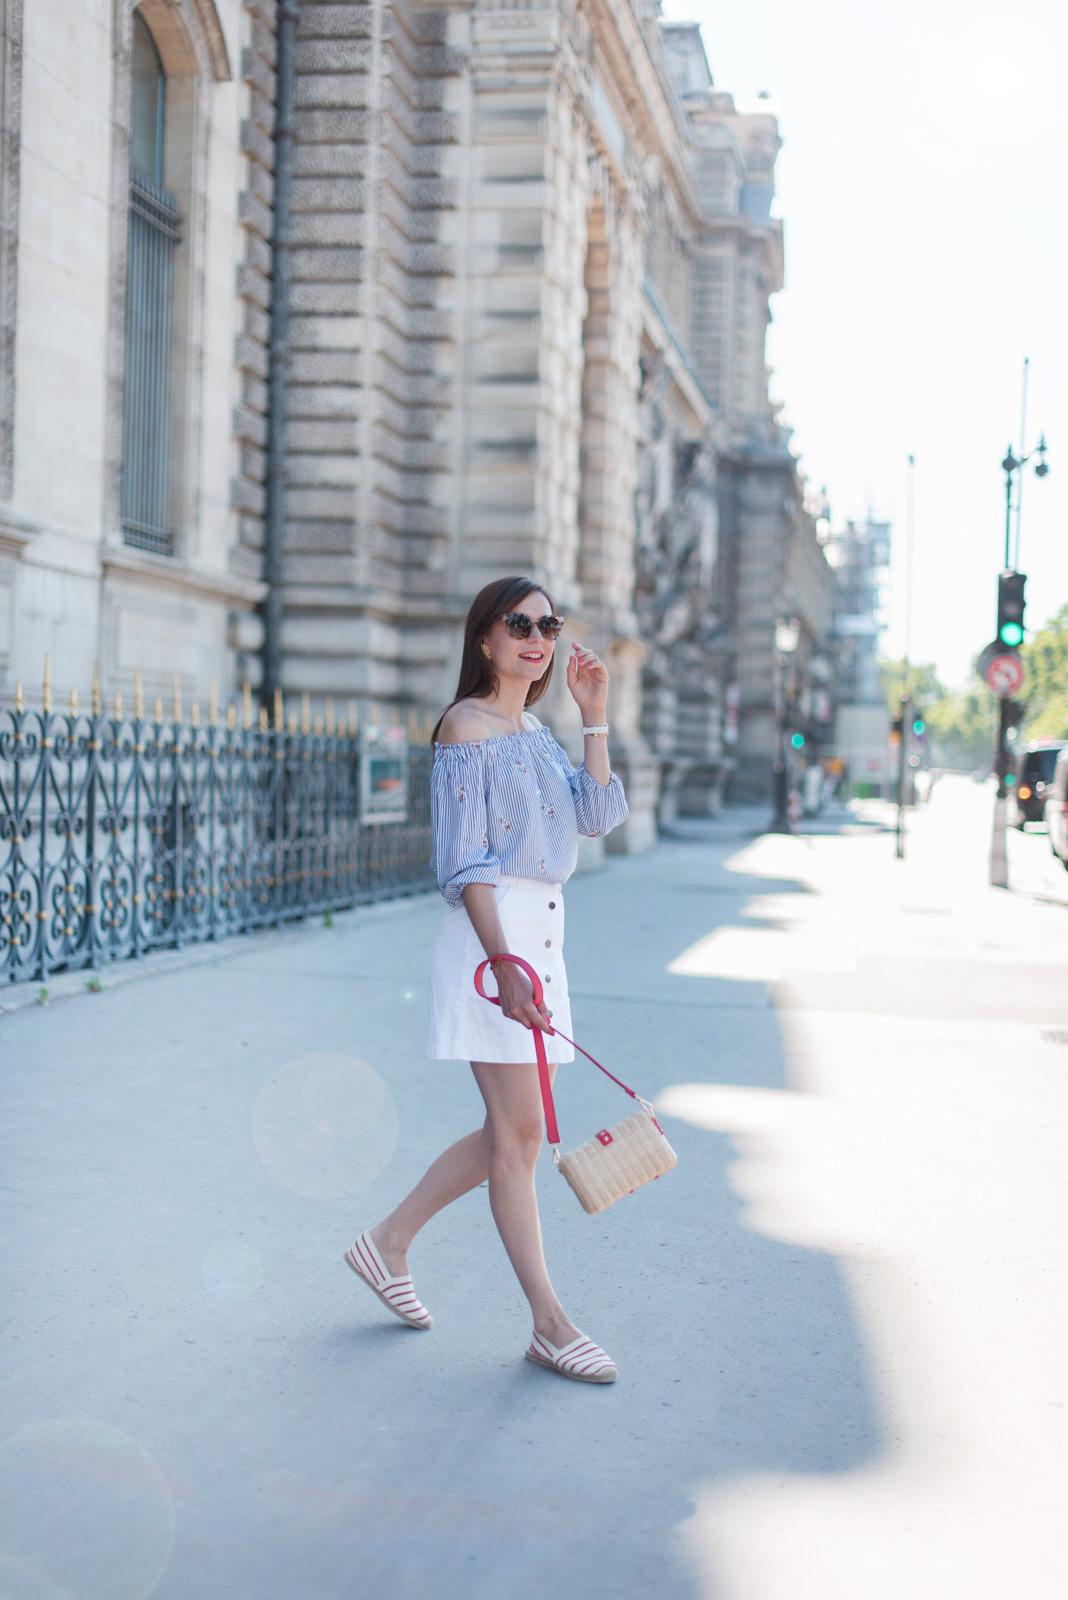 Blog-Mode-And-The-City-Looks-Wishlist-Soldes-Monoprix-3